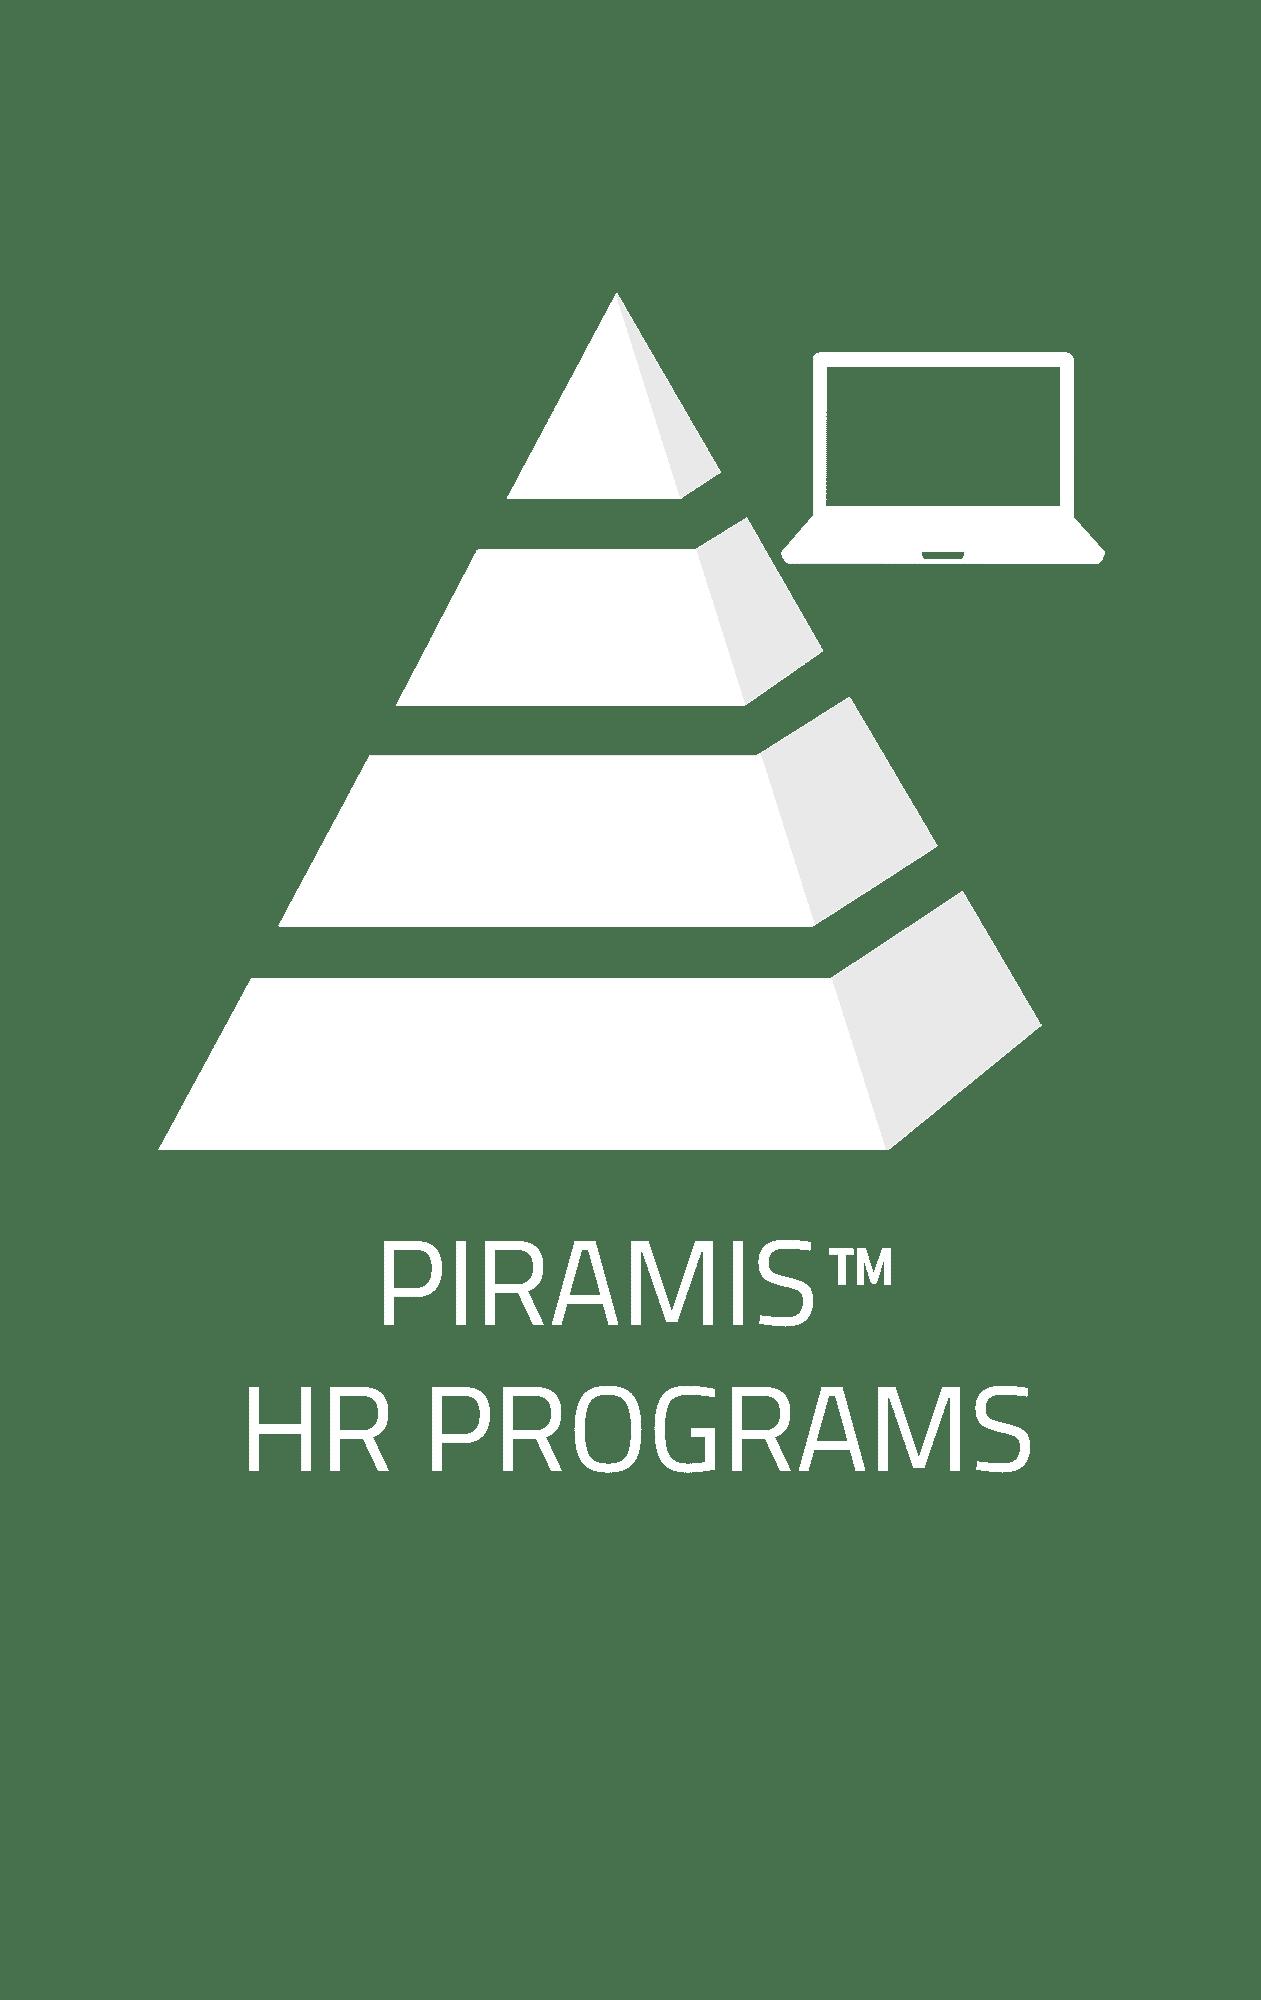 PIRAMIS™ HR Programs